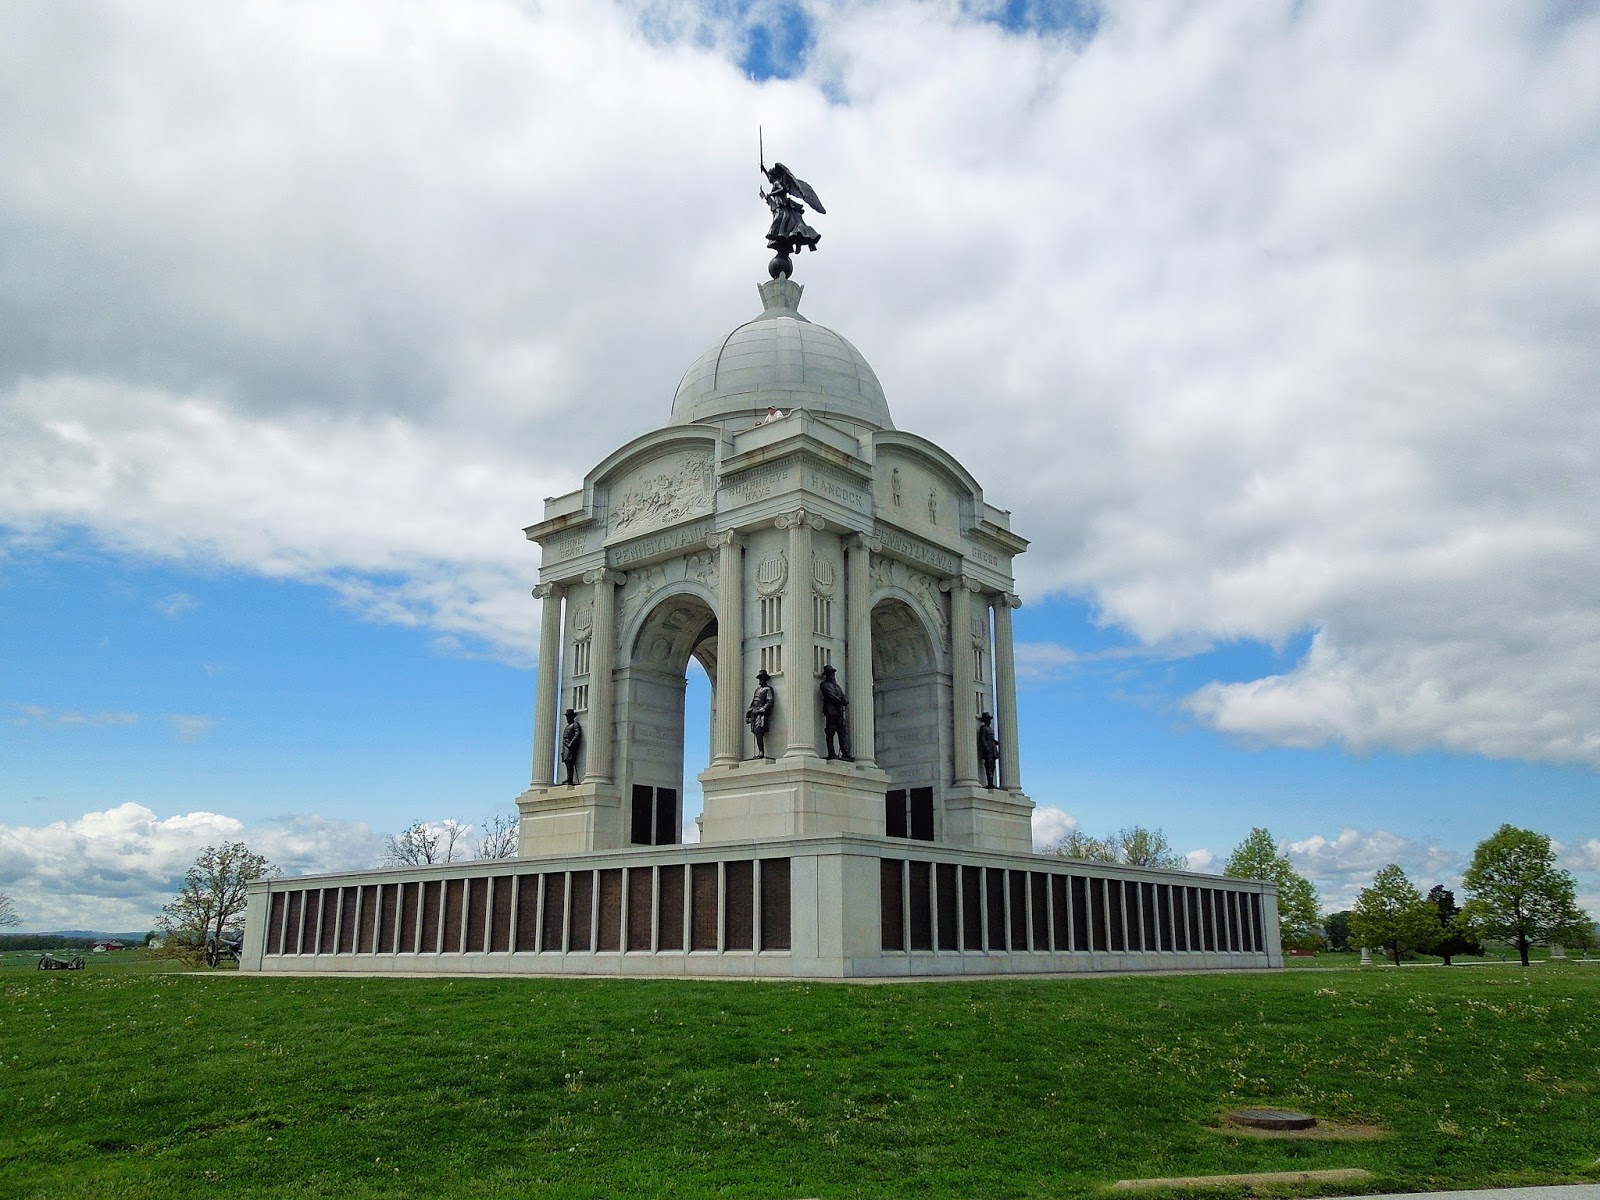 focusing on travel gettysburg national military park u s civil war site